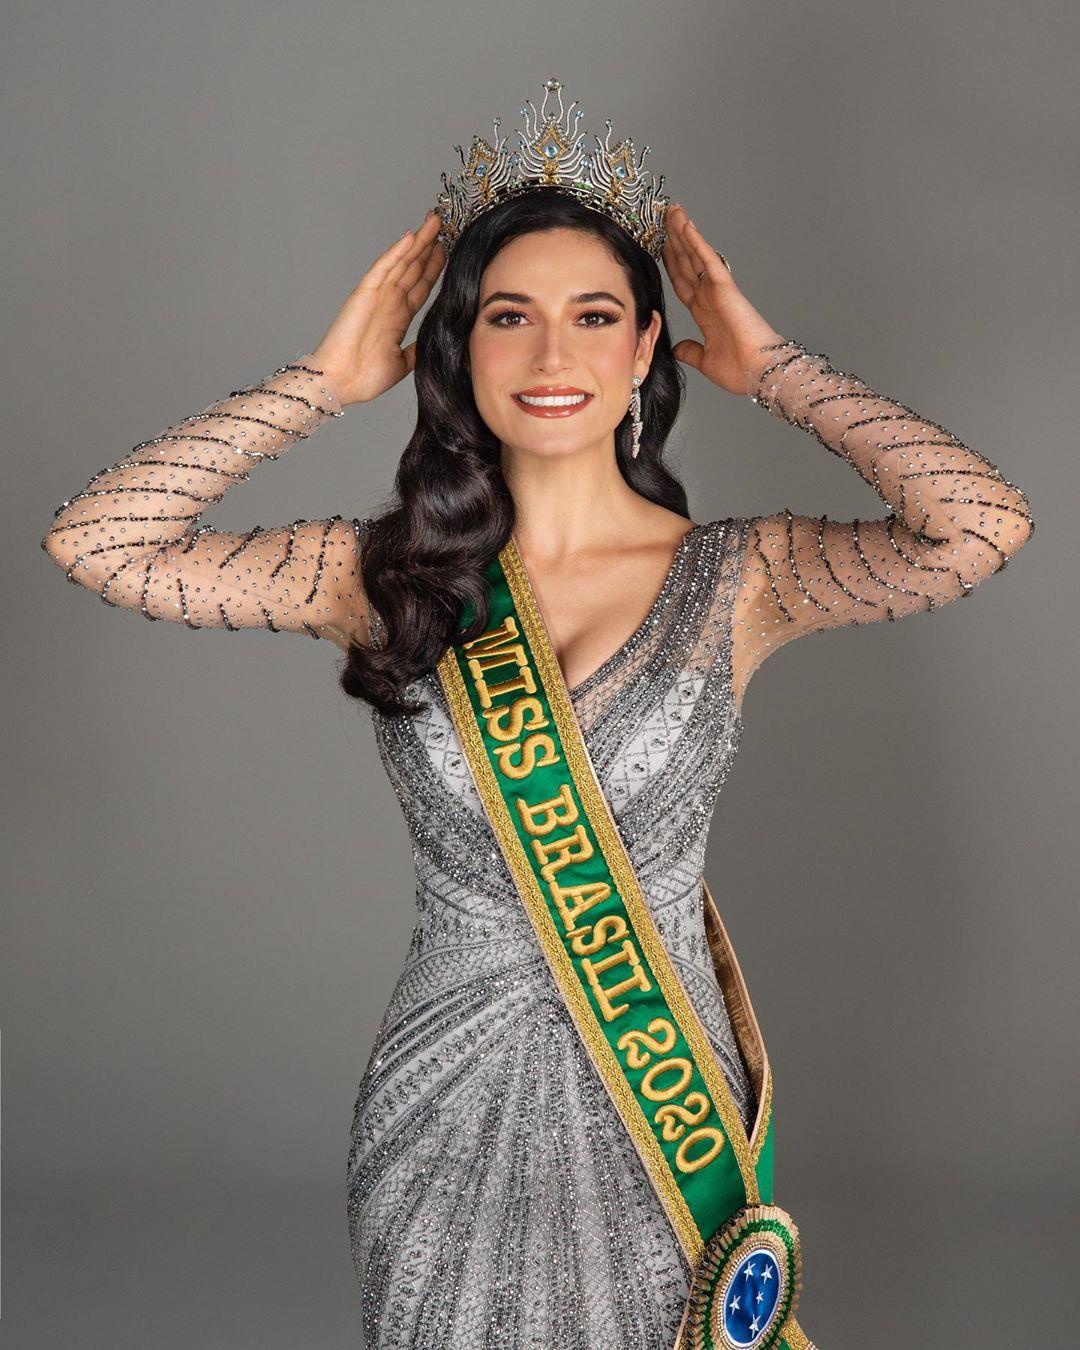 julia gama, miss brasil universo 2020/top 11 de miss world 2014. part I. - Página 4 Juliaw10